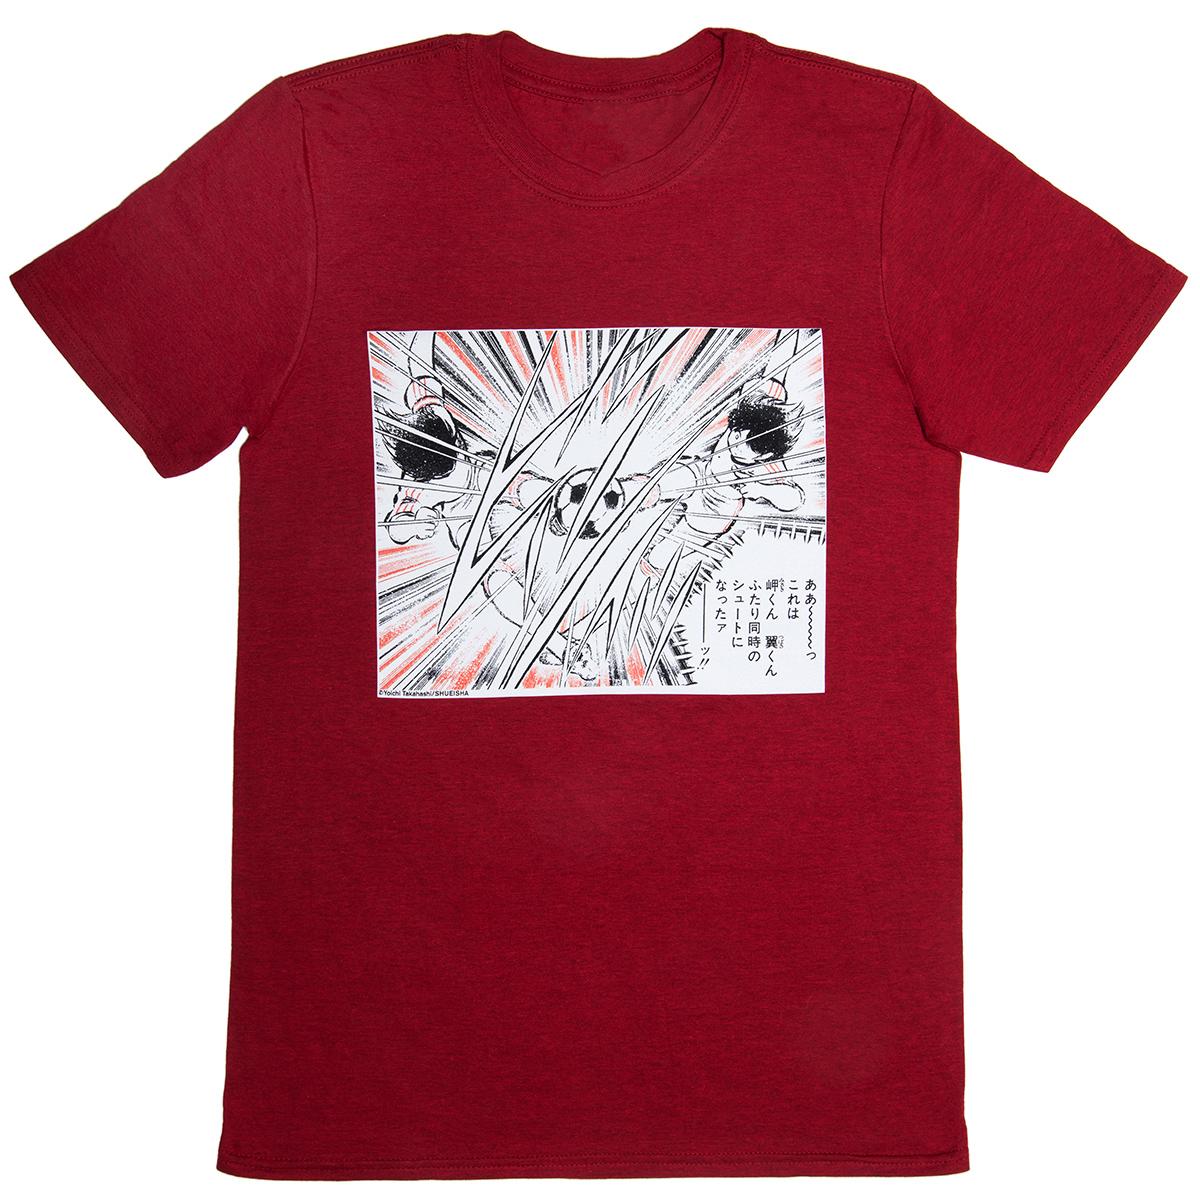 Captain Tsubasa t-shirt  (L)